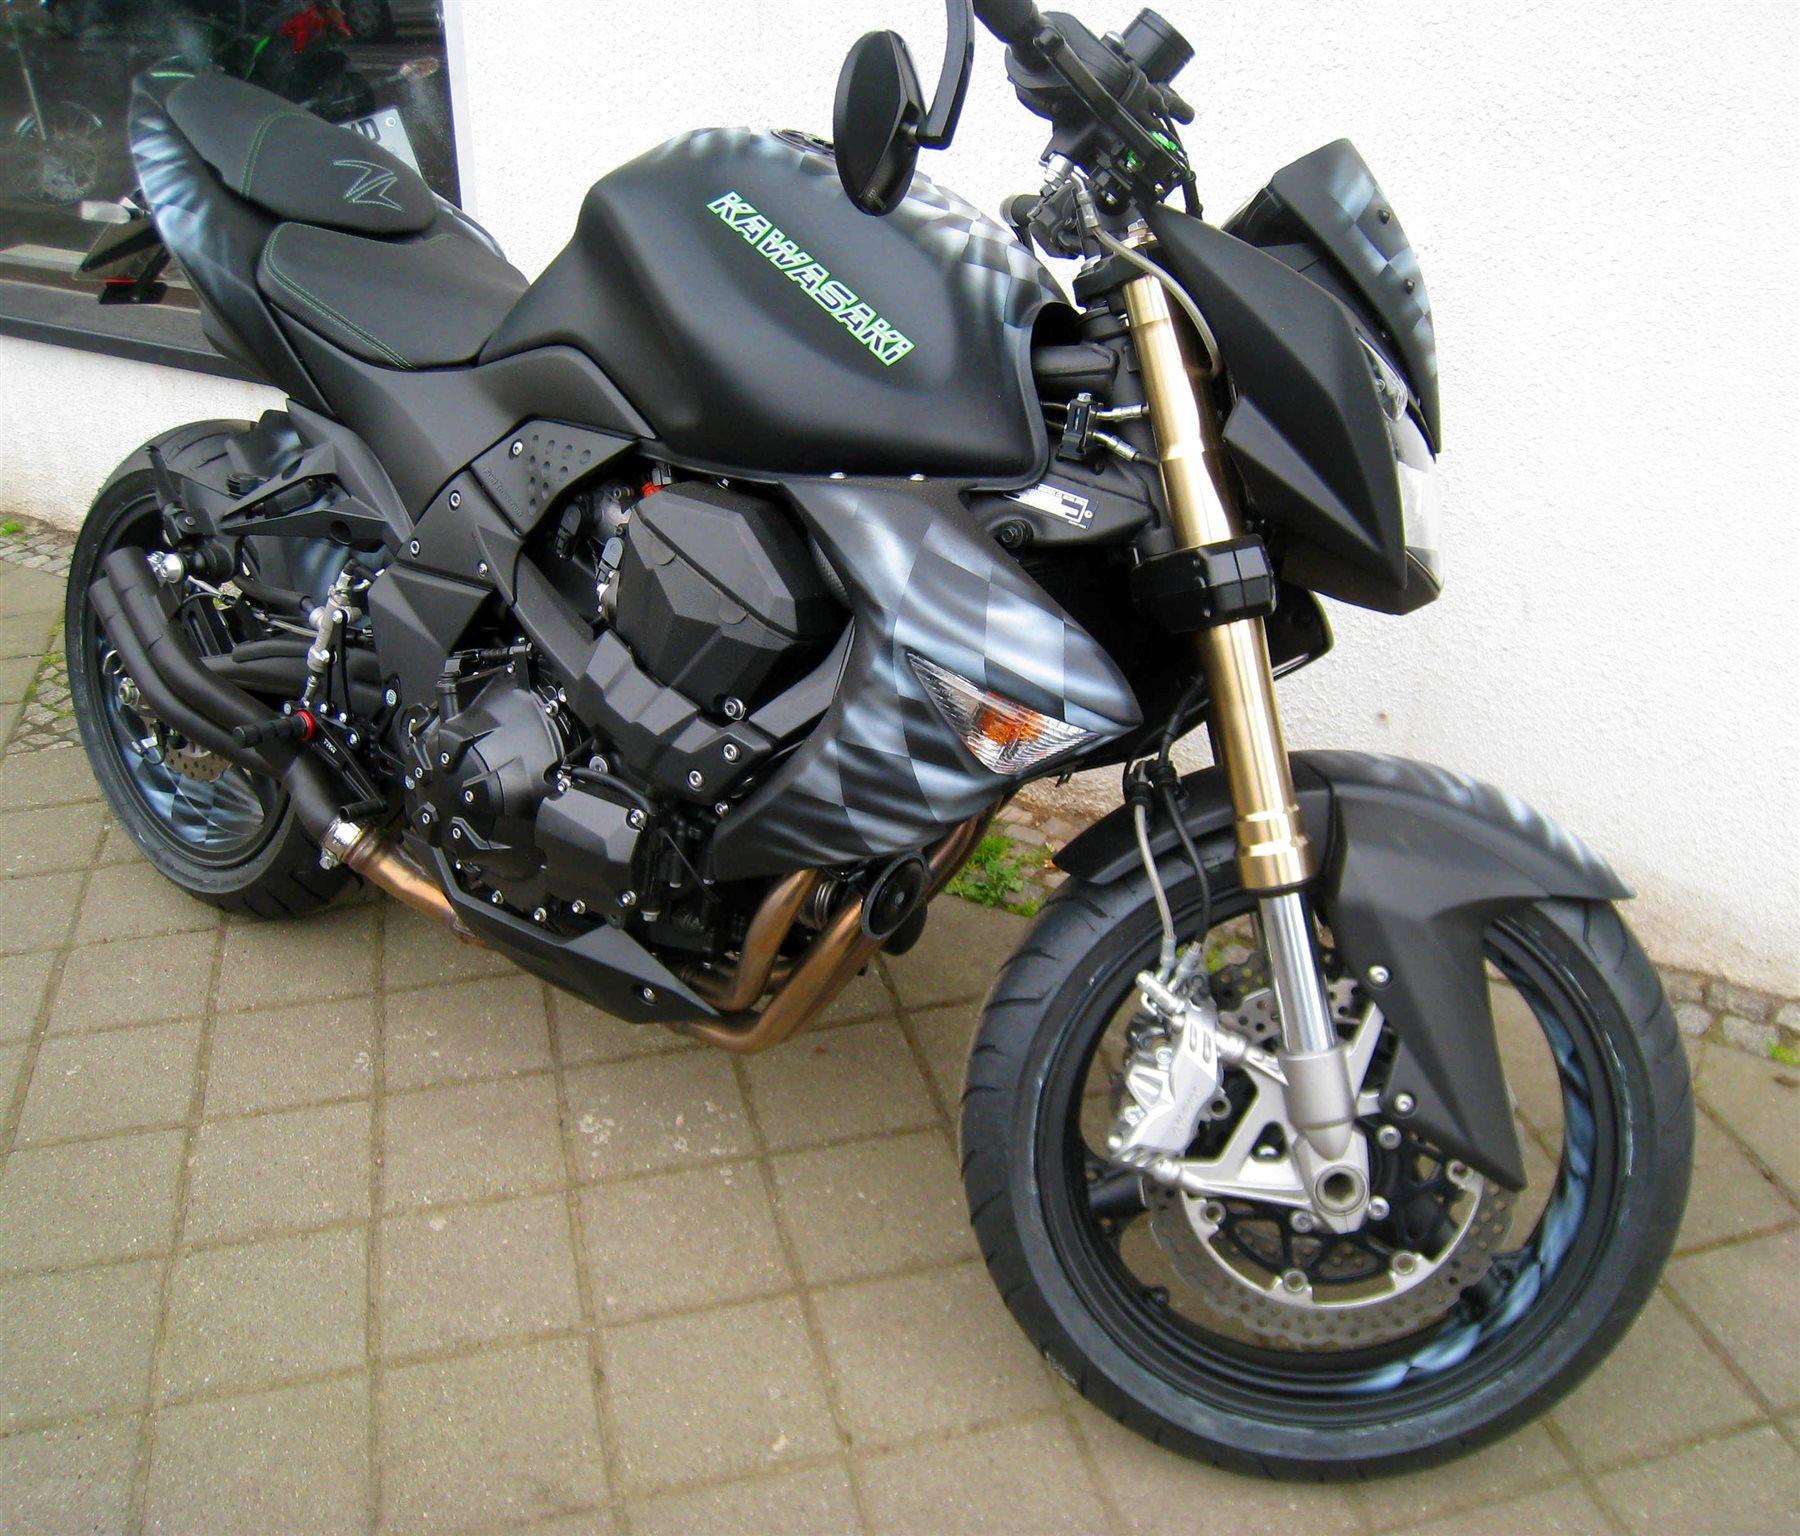 Umgebautes Motorrad Kawasaki Z1000 Von Motorradsport Schadenberg GbR